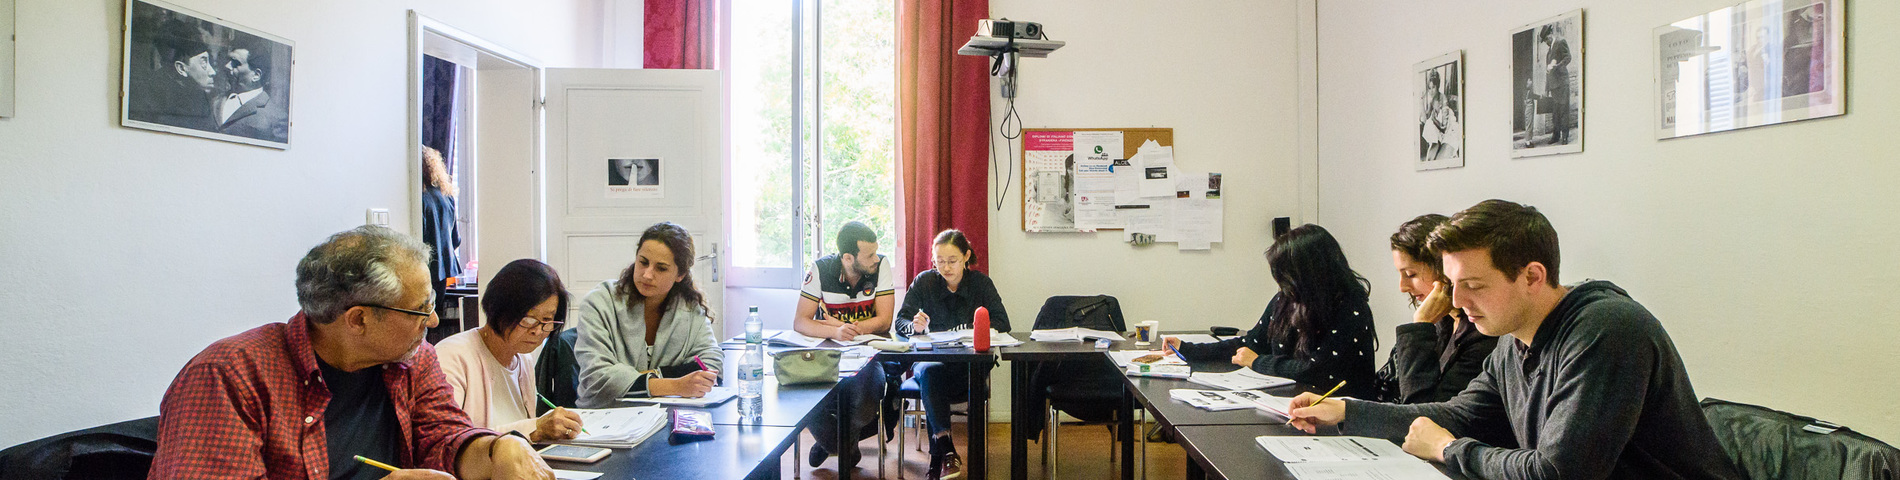 A.L.C.E. Accademia Lingue e Culture Europee bild 1